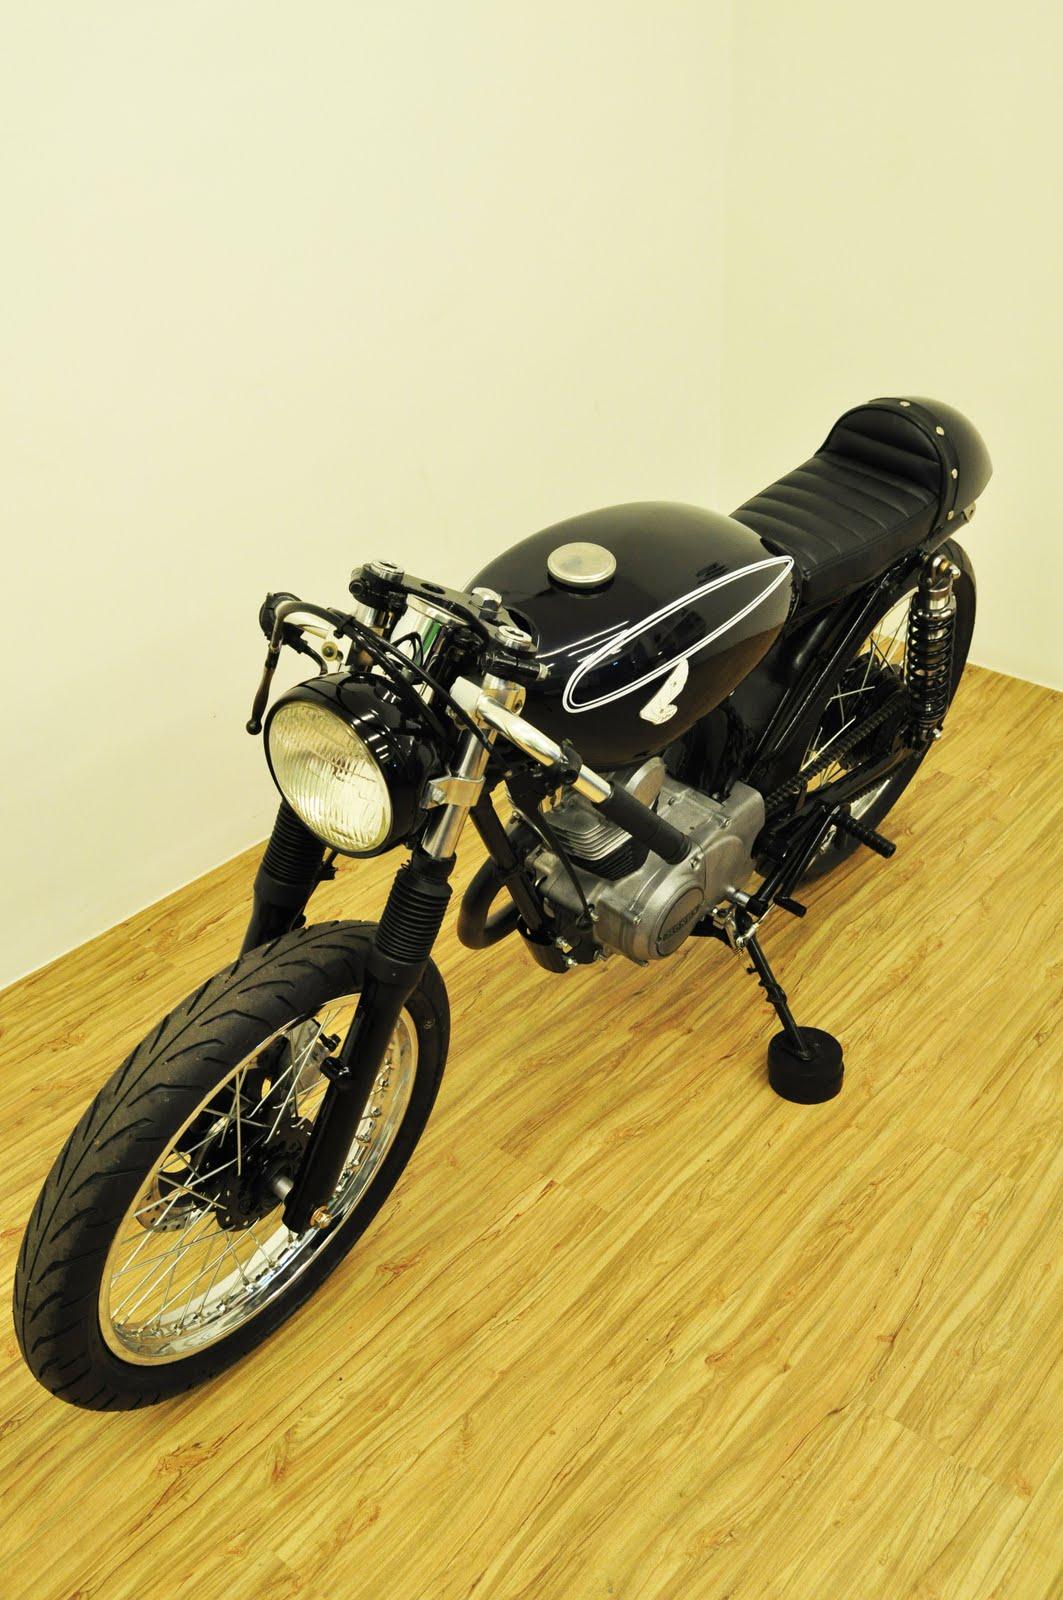 Ducati Scrambler Cafe Racer >> Cafe Racer Special: Honda CB 100 Cafe Racer